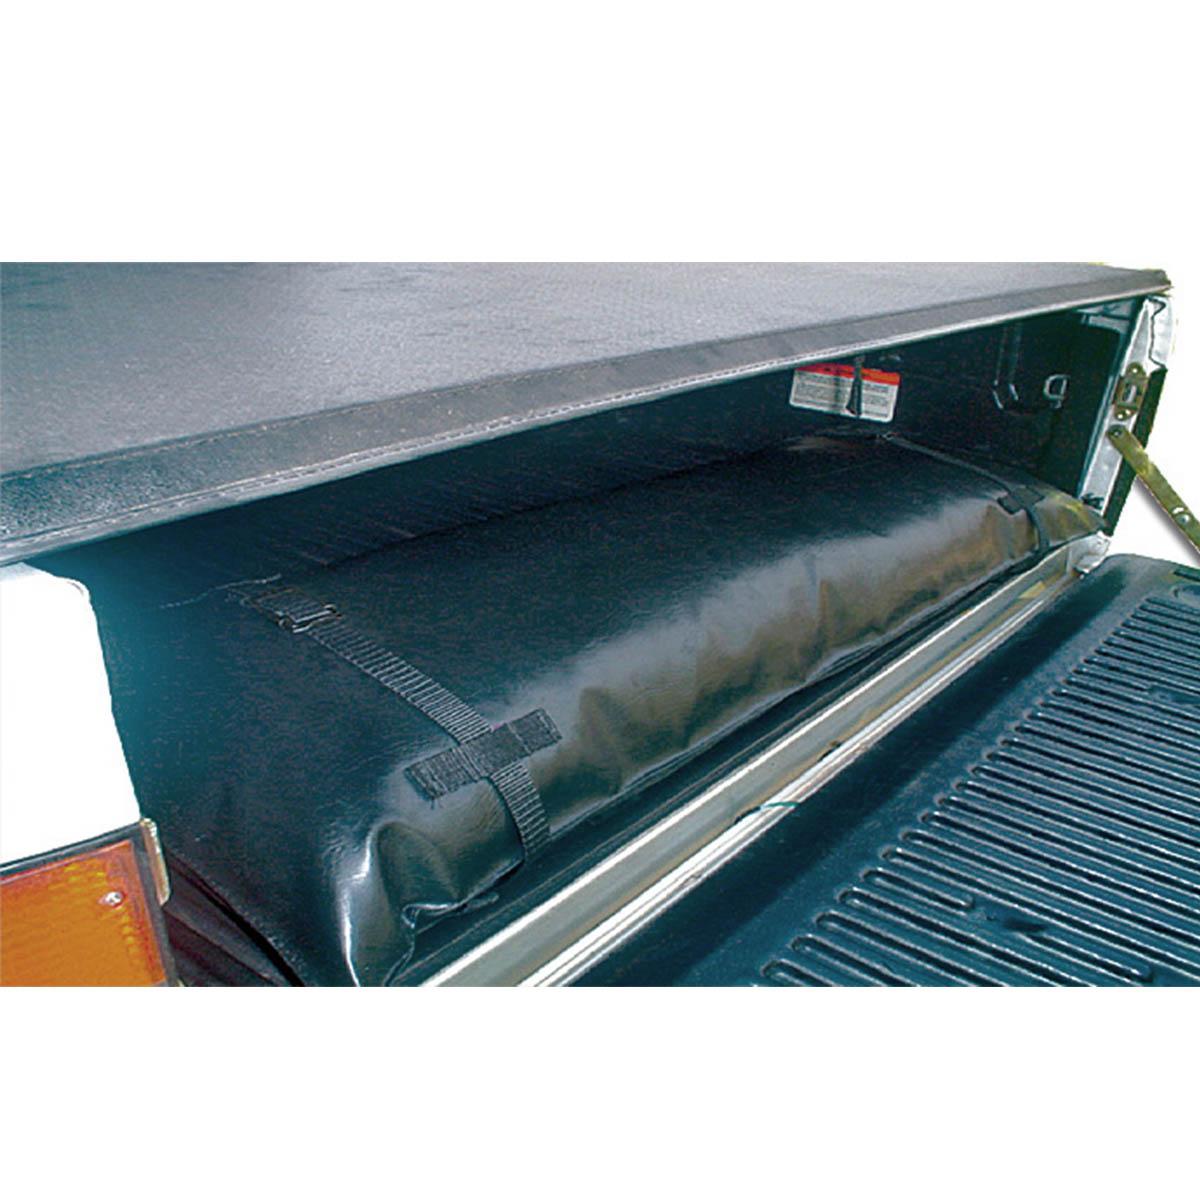 Saco de areia para ca�amba L200 GL 1999 a 2005 ou L200 GLS 1999 a 2007